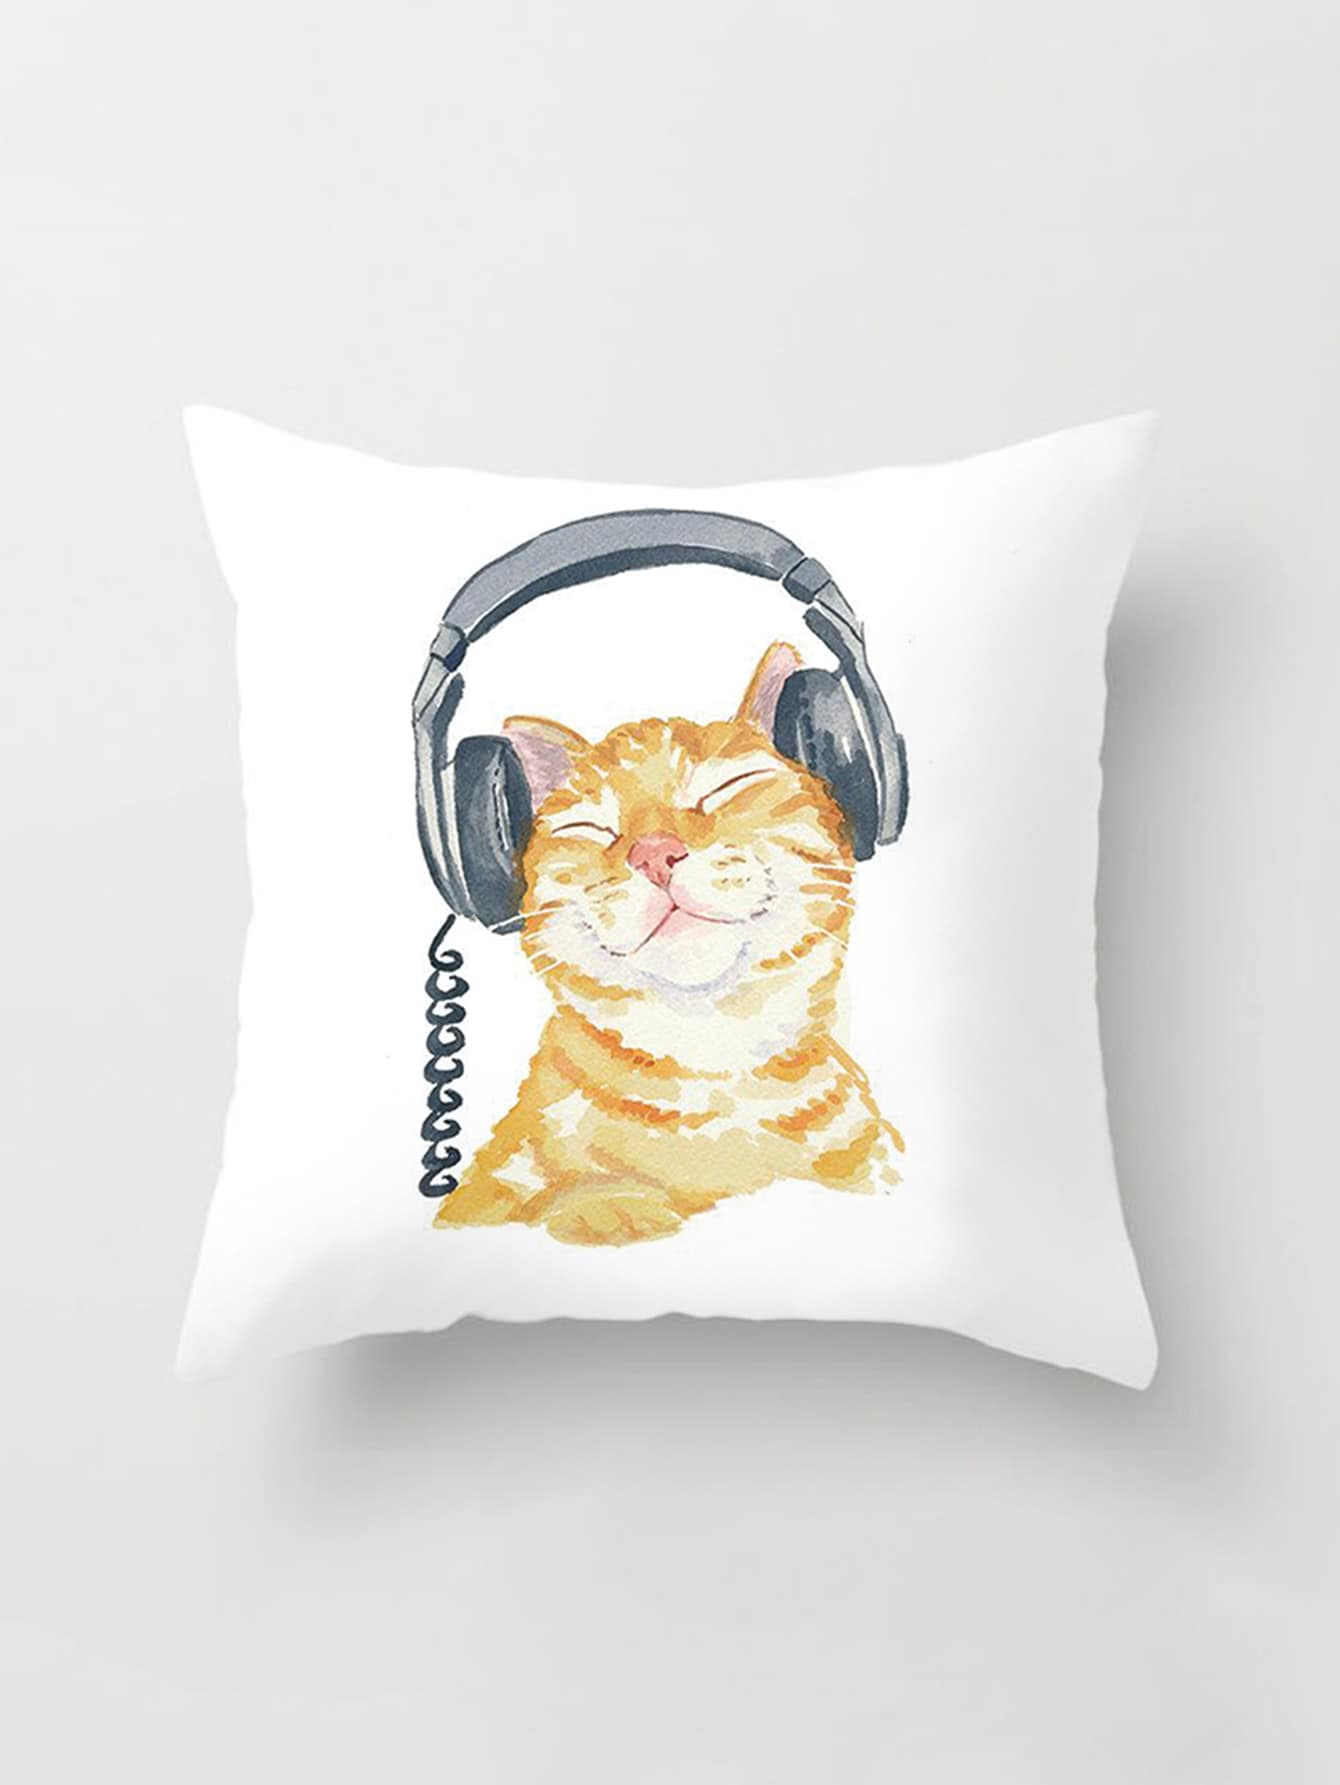 Cat Print Pillowcase Cover pug print pillowcase cover